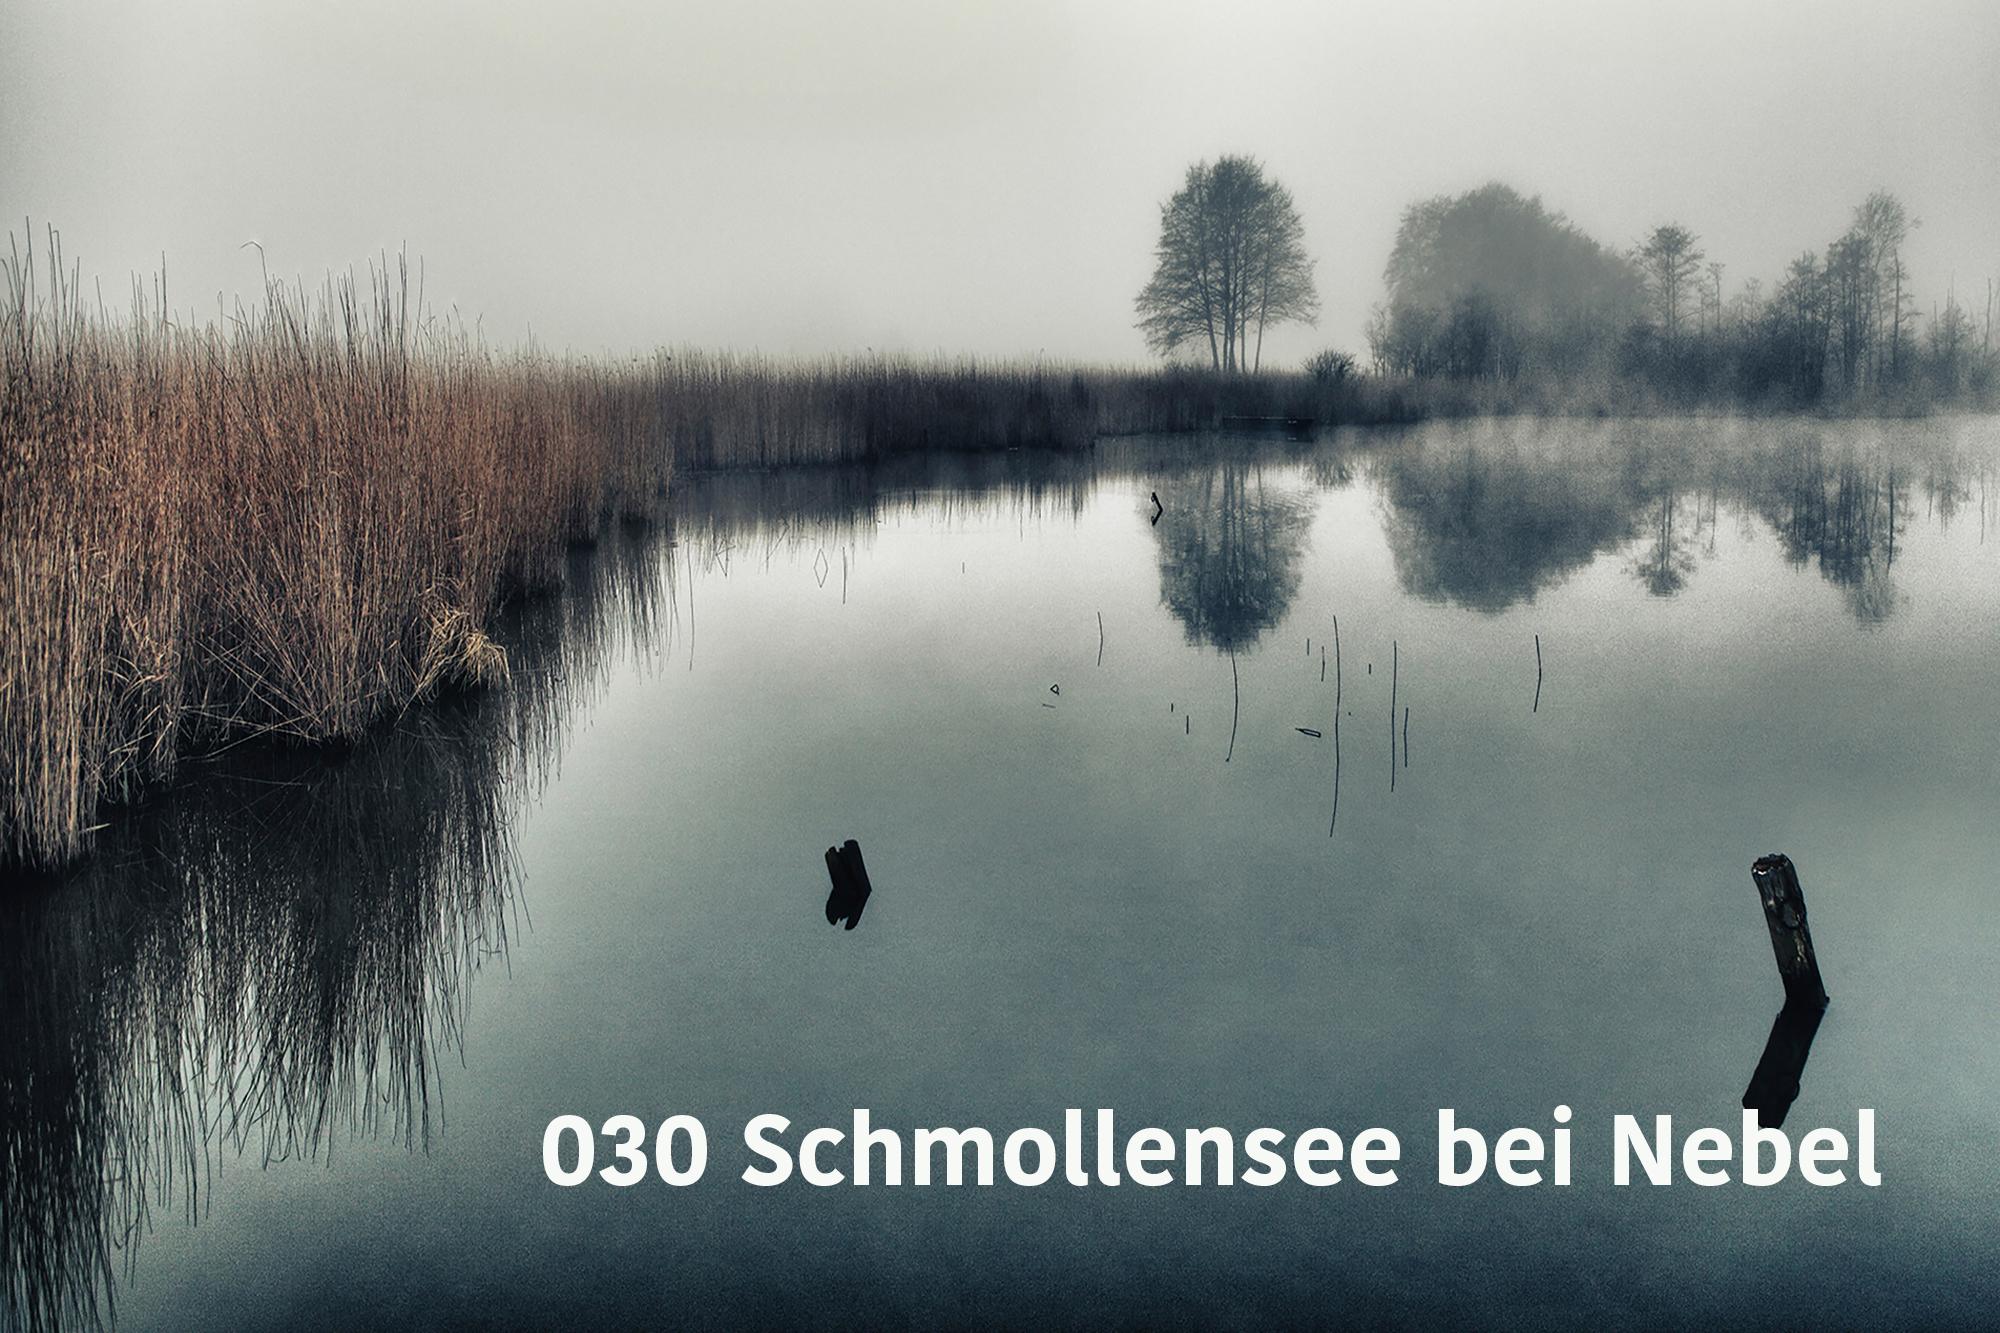 Usedom Motive (2) Canvasleinwanddruck auf Keilrahmen 50 x 75